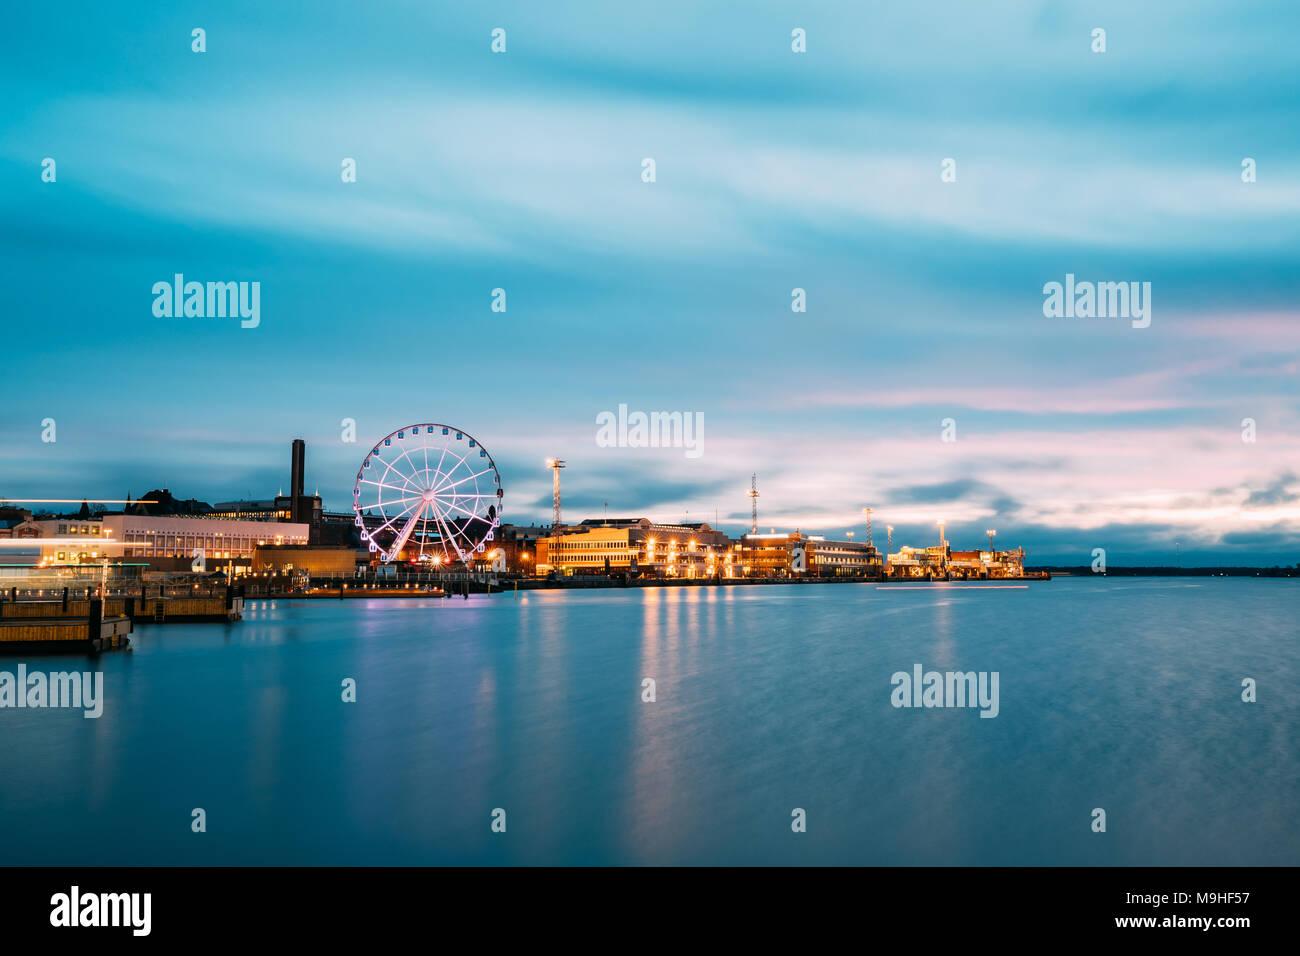 Helsinki, Finnland. Blick auf den Bahndamm mit Riesenrad am Abend Nacht Illuminationen. Stockbild